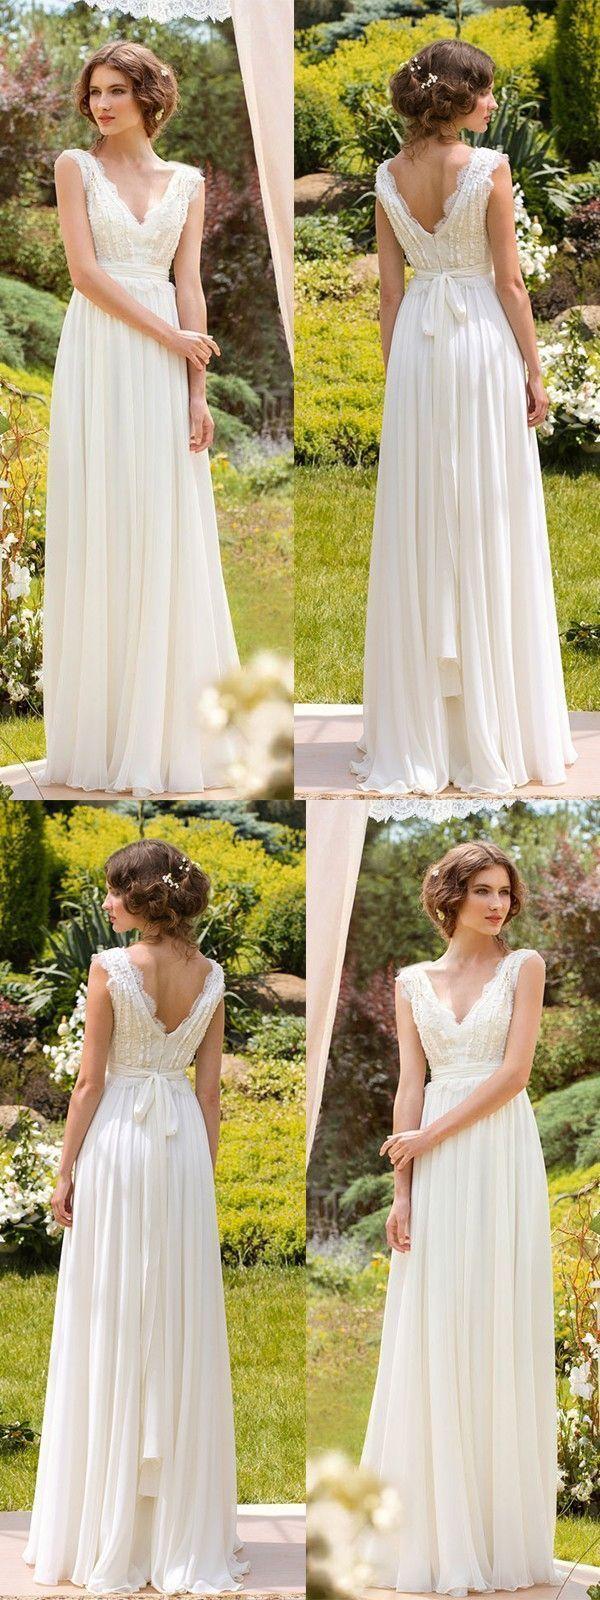 Simple Wedding Dresses V-neck Floor-length Chiffon Sexy Lace... annapromdress.com #SimpleWeddingIdeas #beachweddingdresses